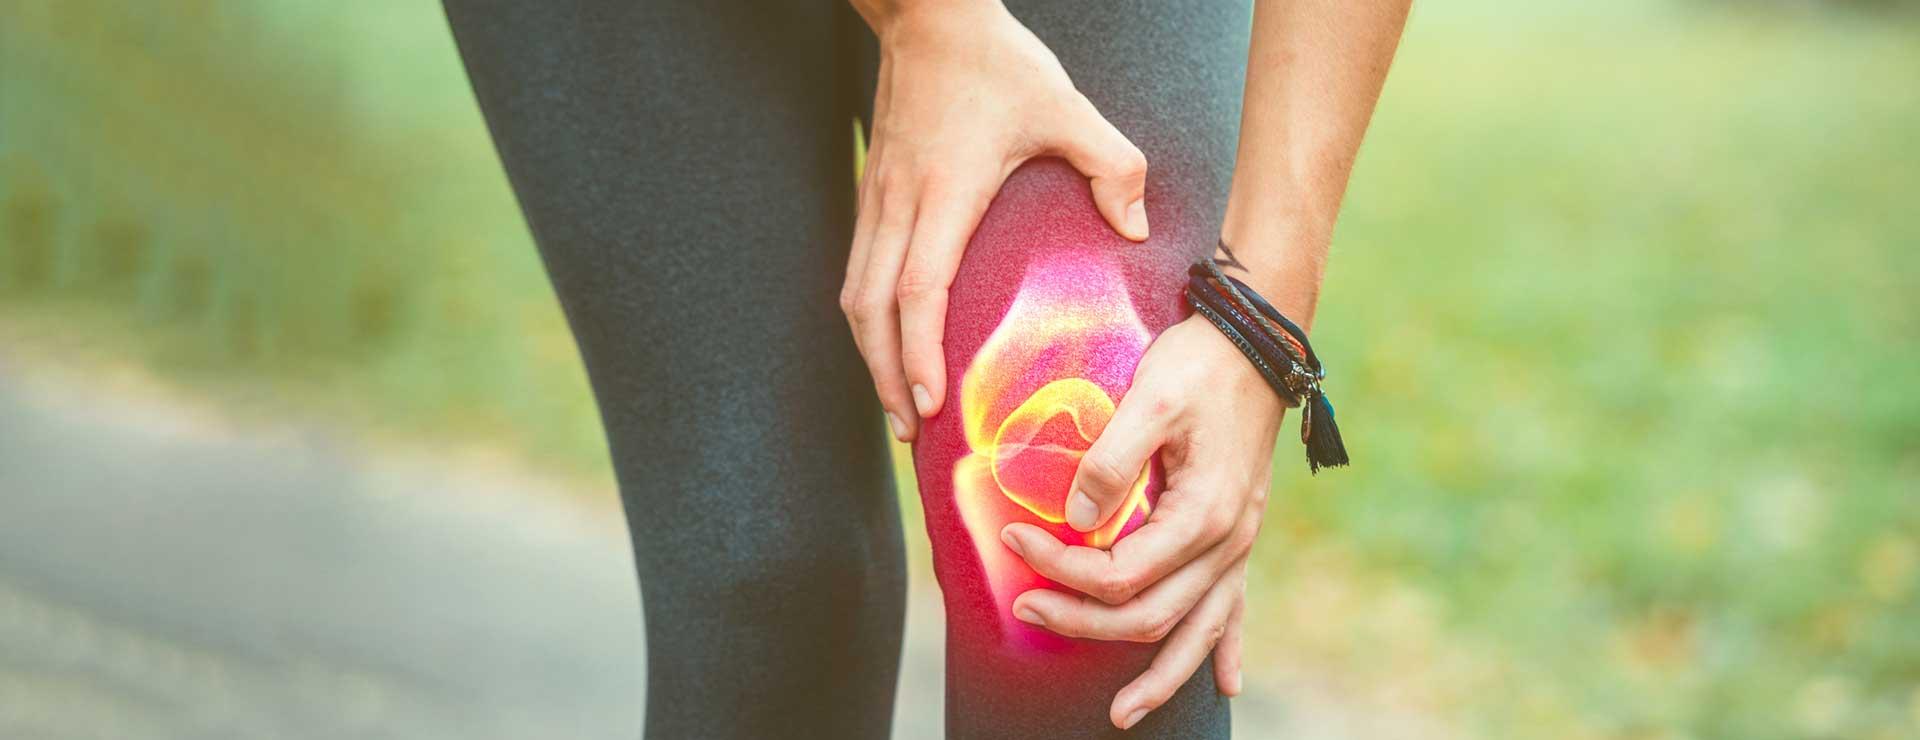 Knee Ligament Repair   Johns Hopkins Medicine